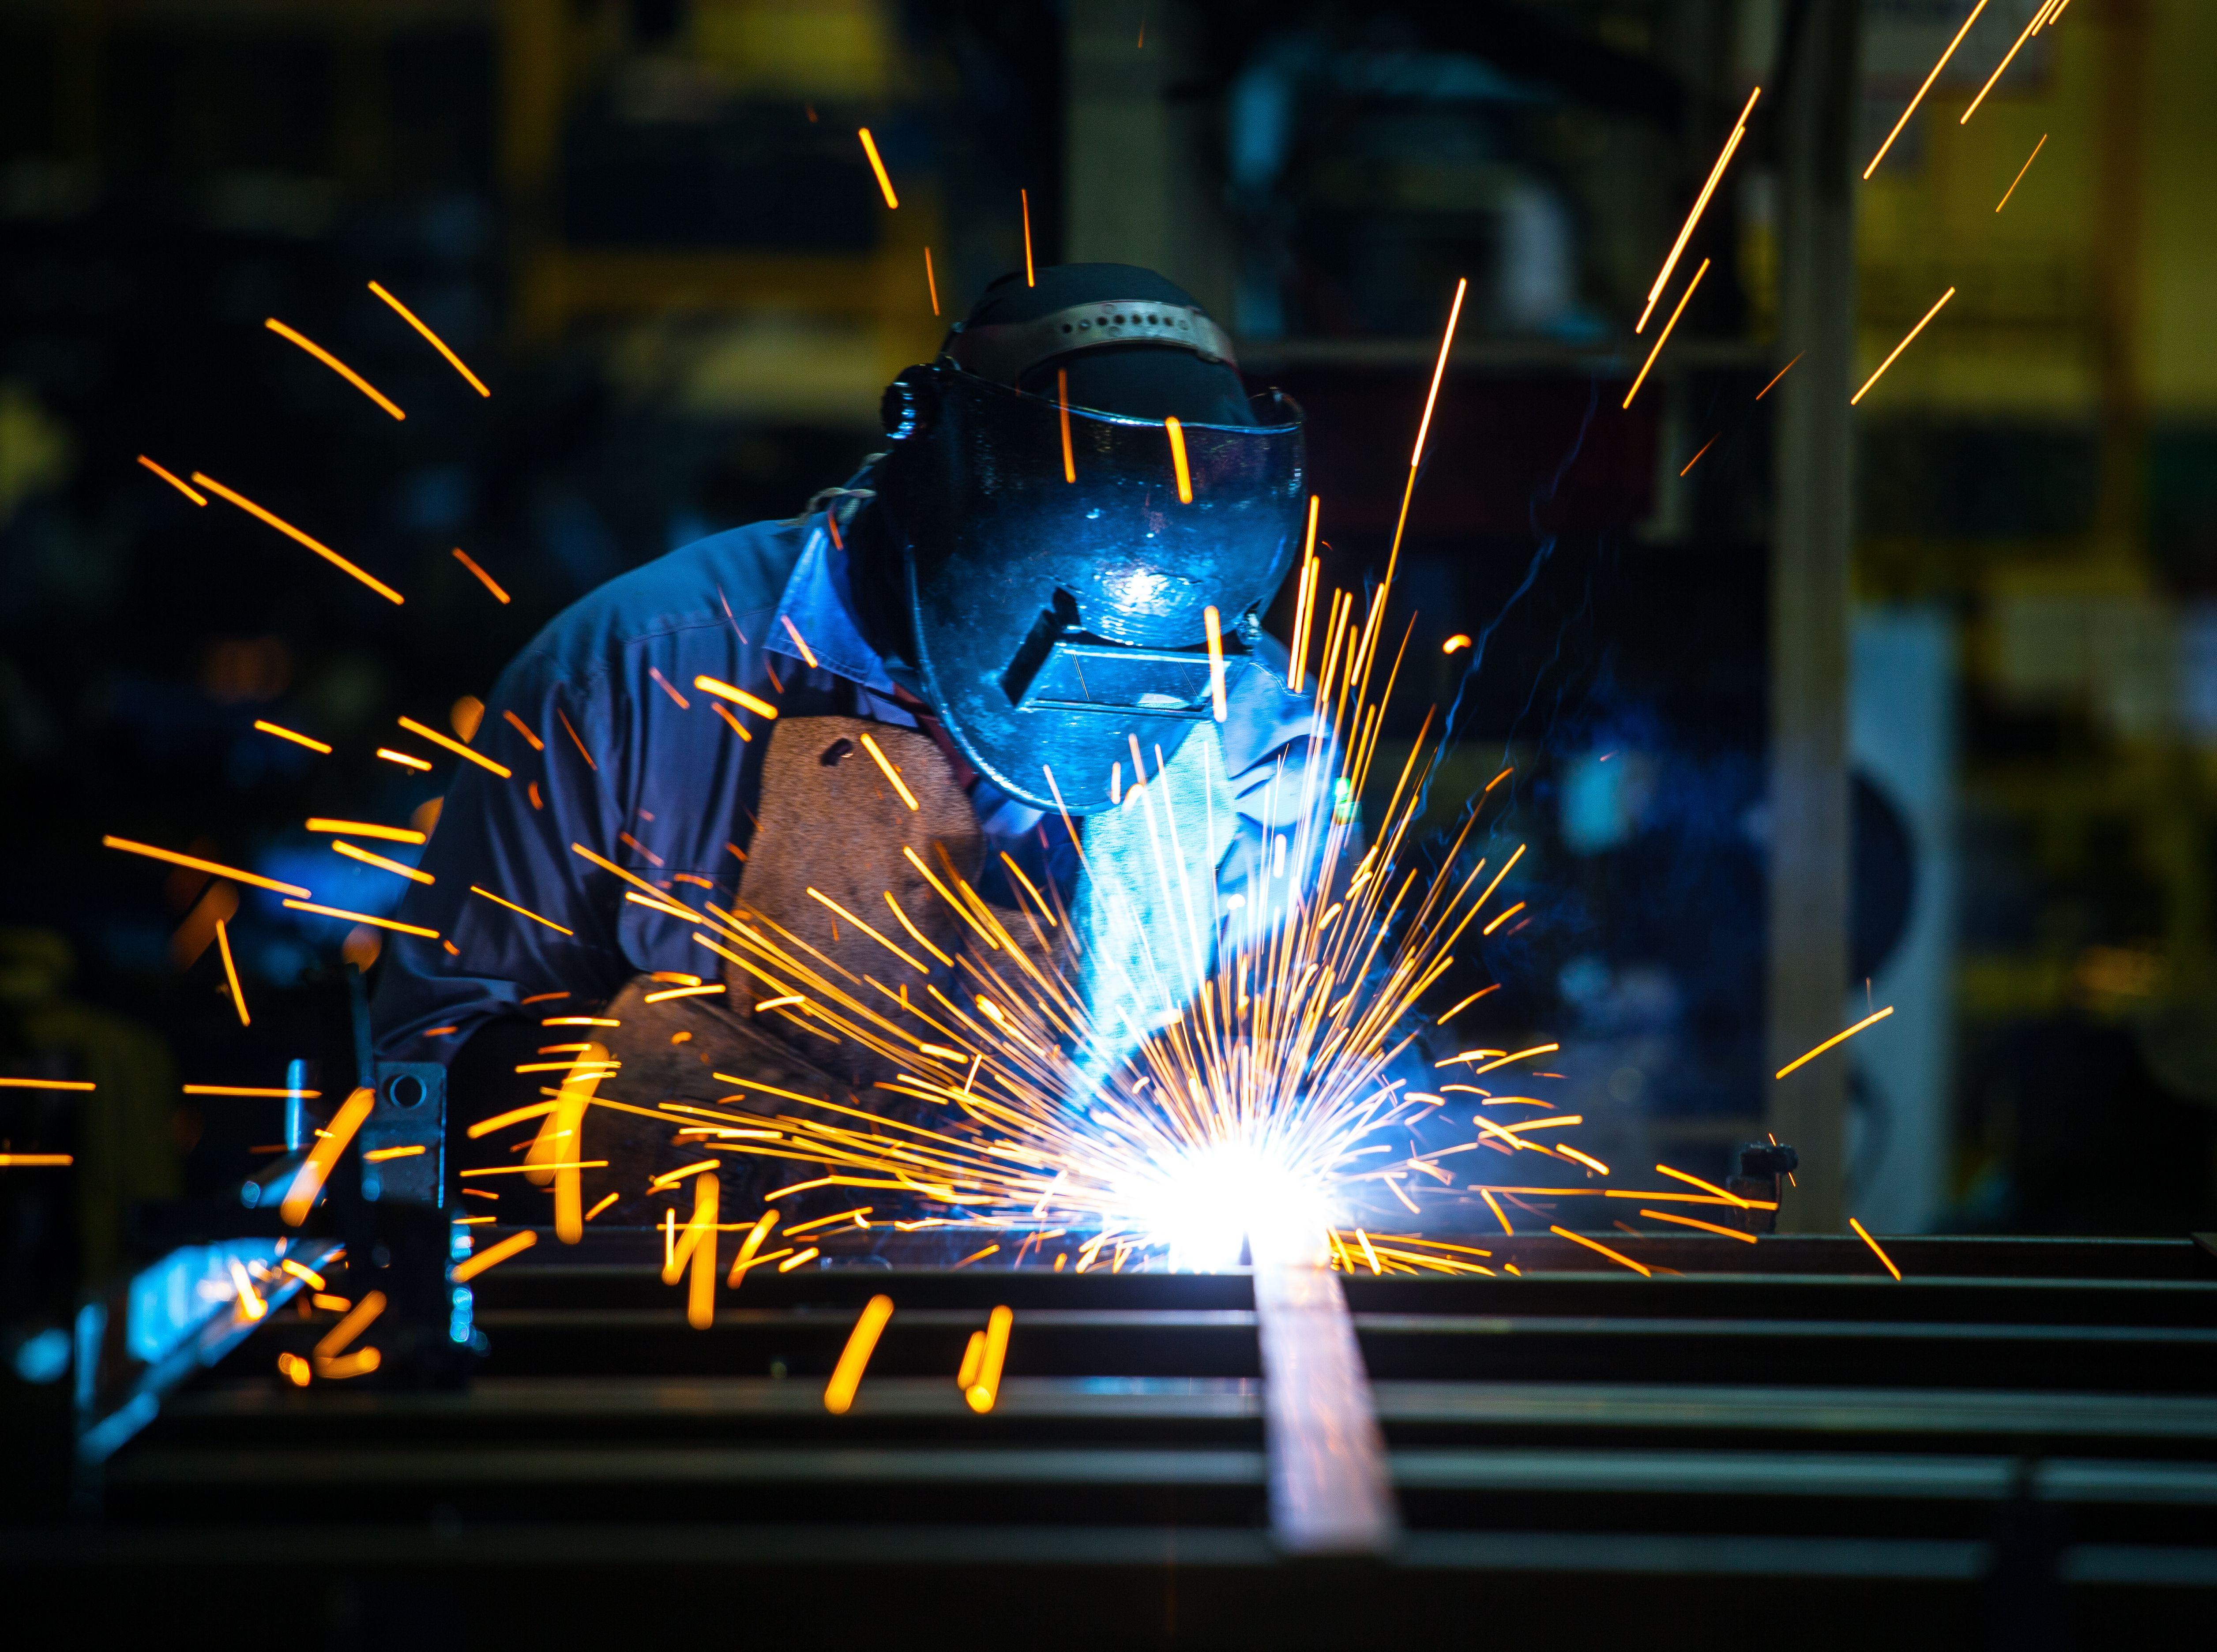 Welding Welding Inspector Welding Welding Services